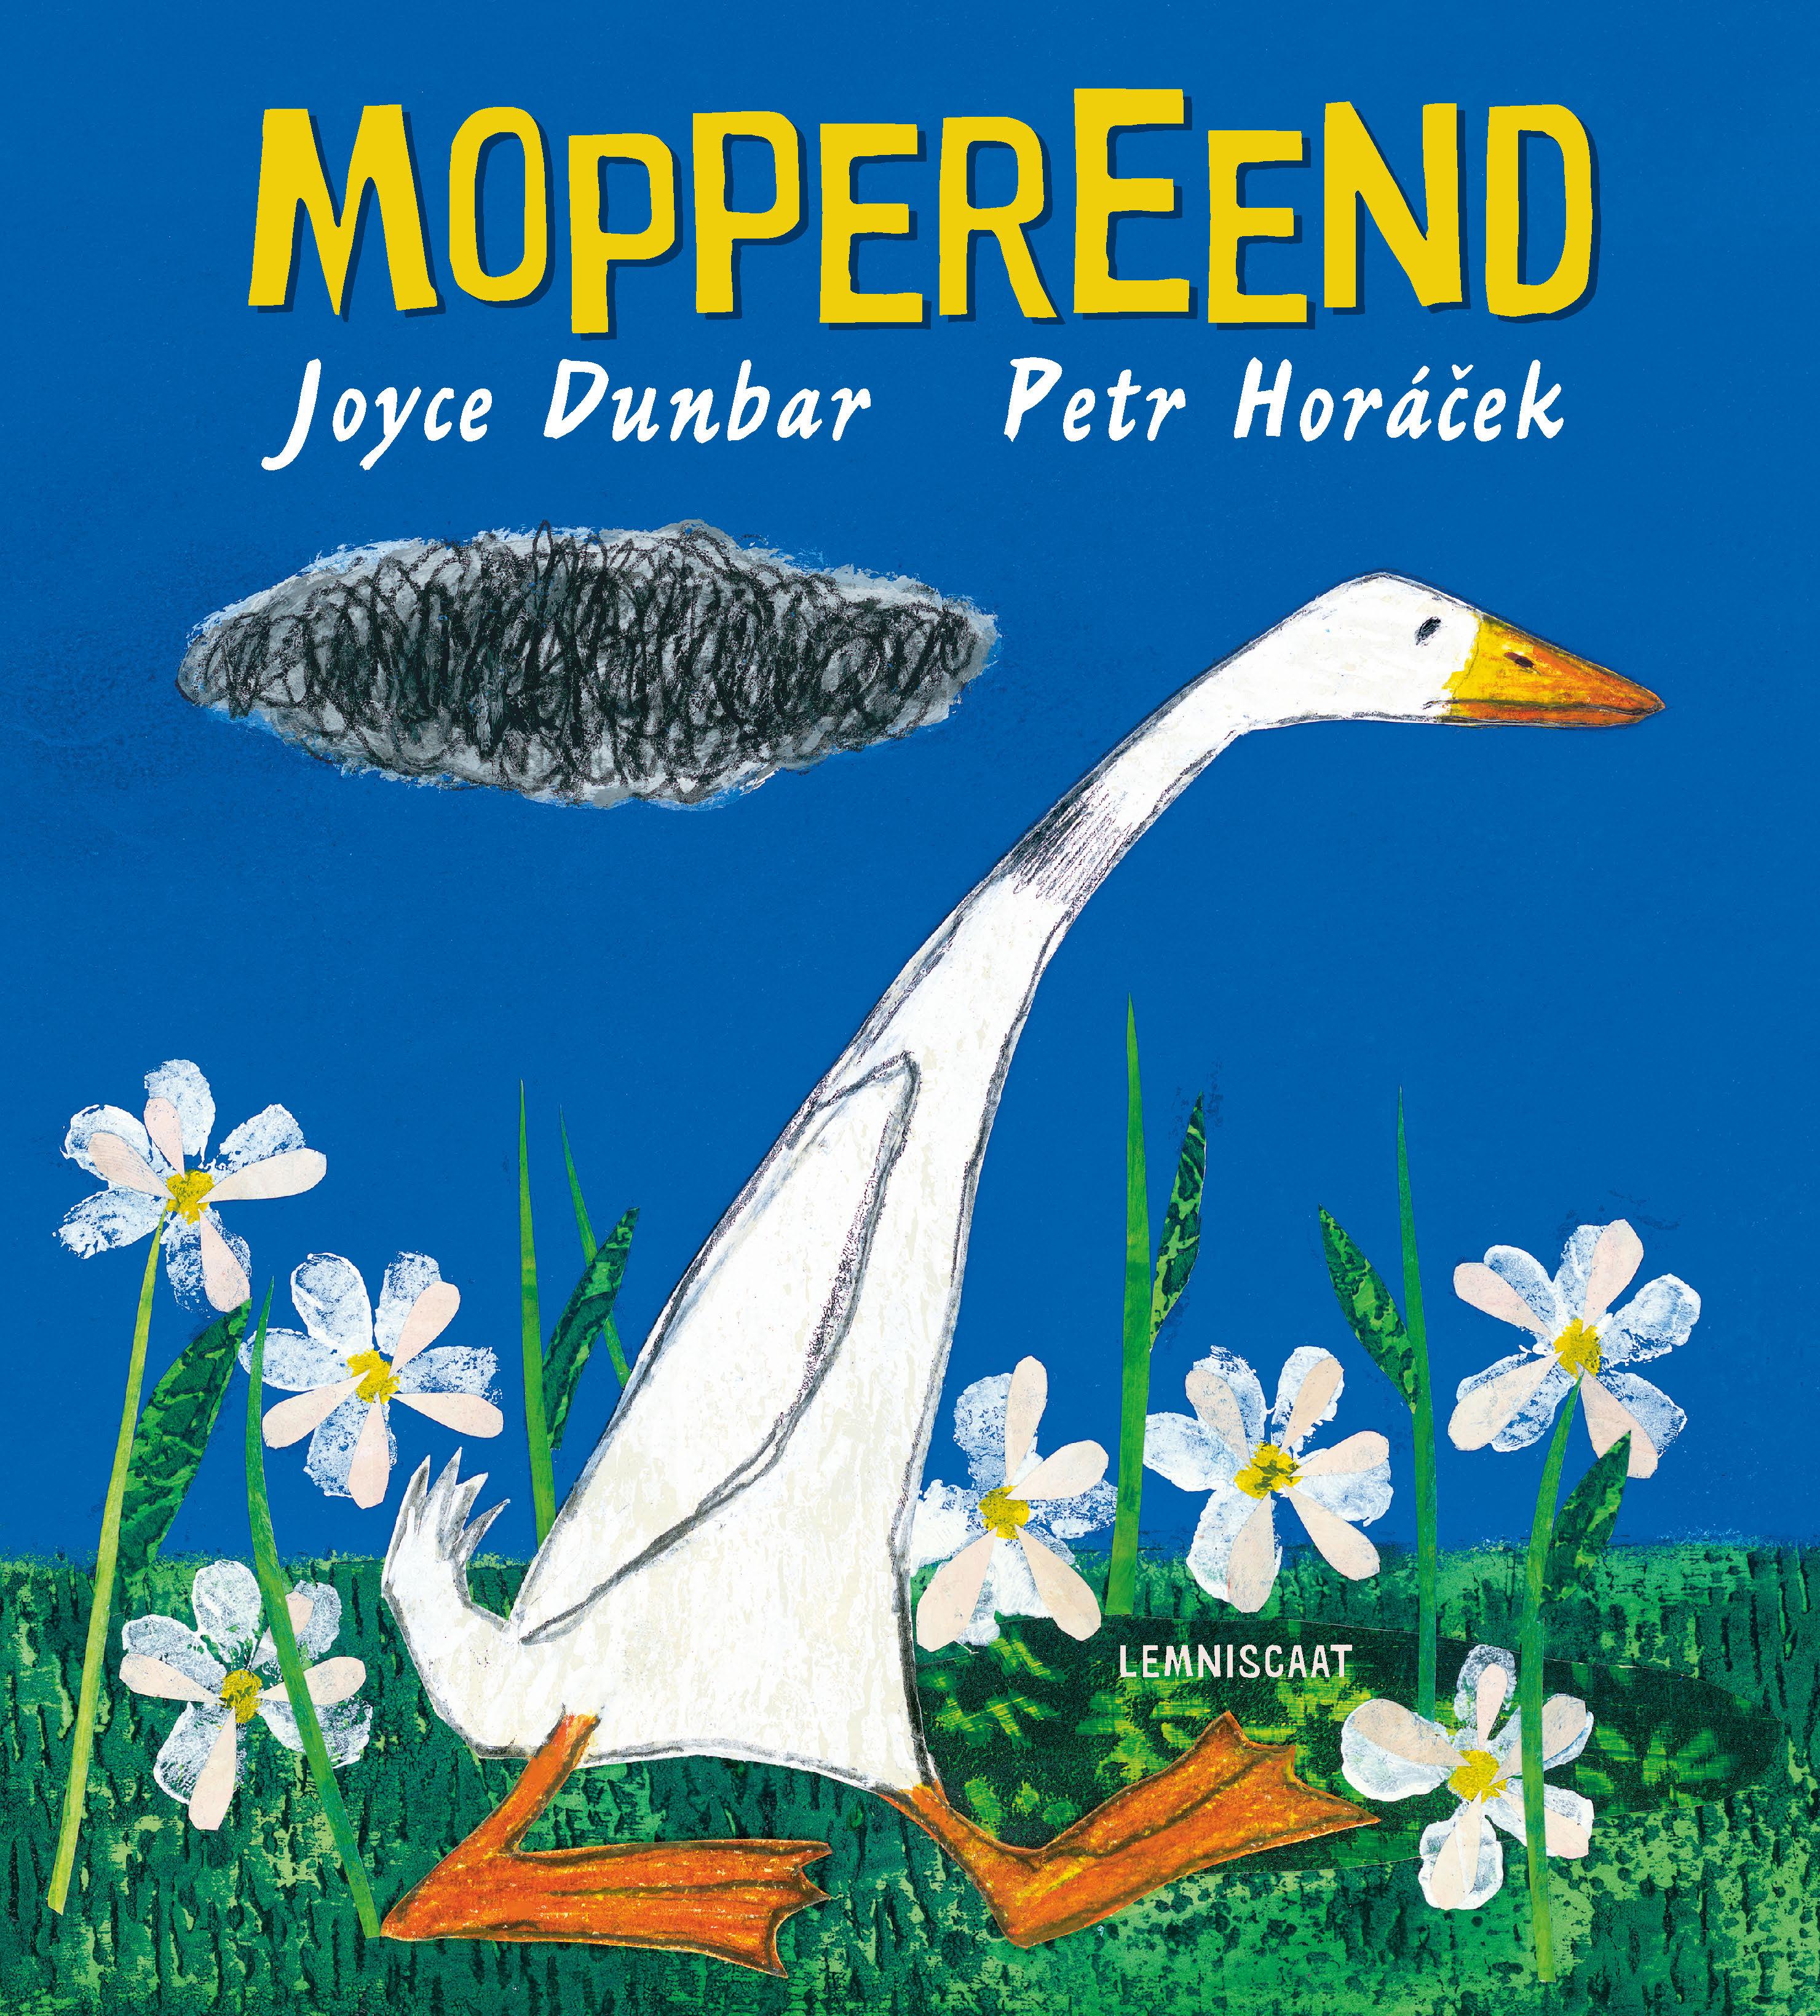 Moppereend Joyce Dunbar Casperle